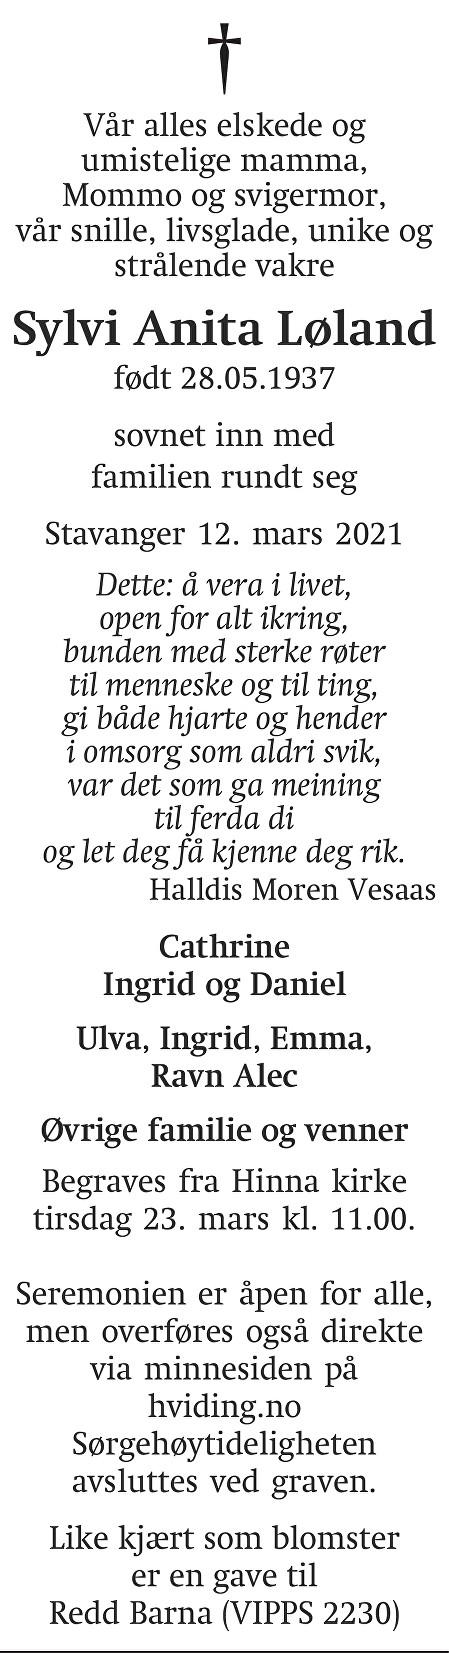 Sylvi Anita Løland Dødsannonse